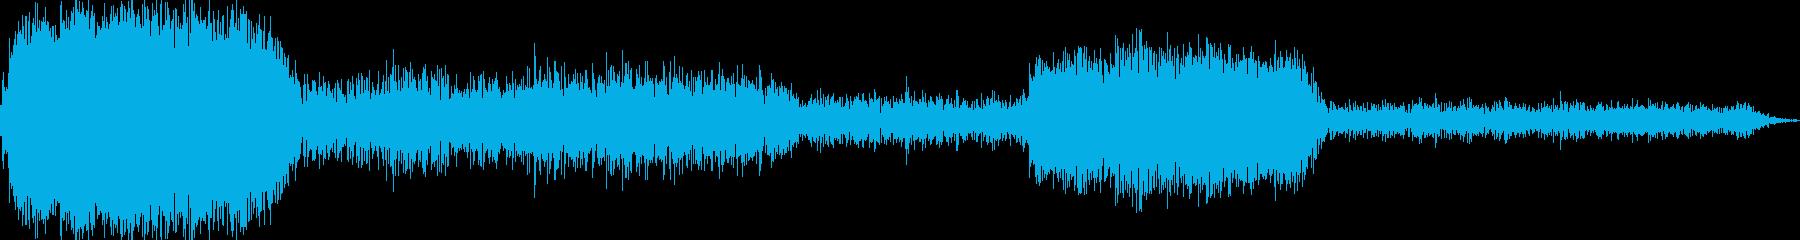 AMGアナログFX 51の再生済みの波形